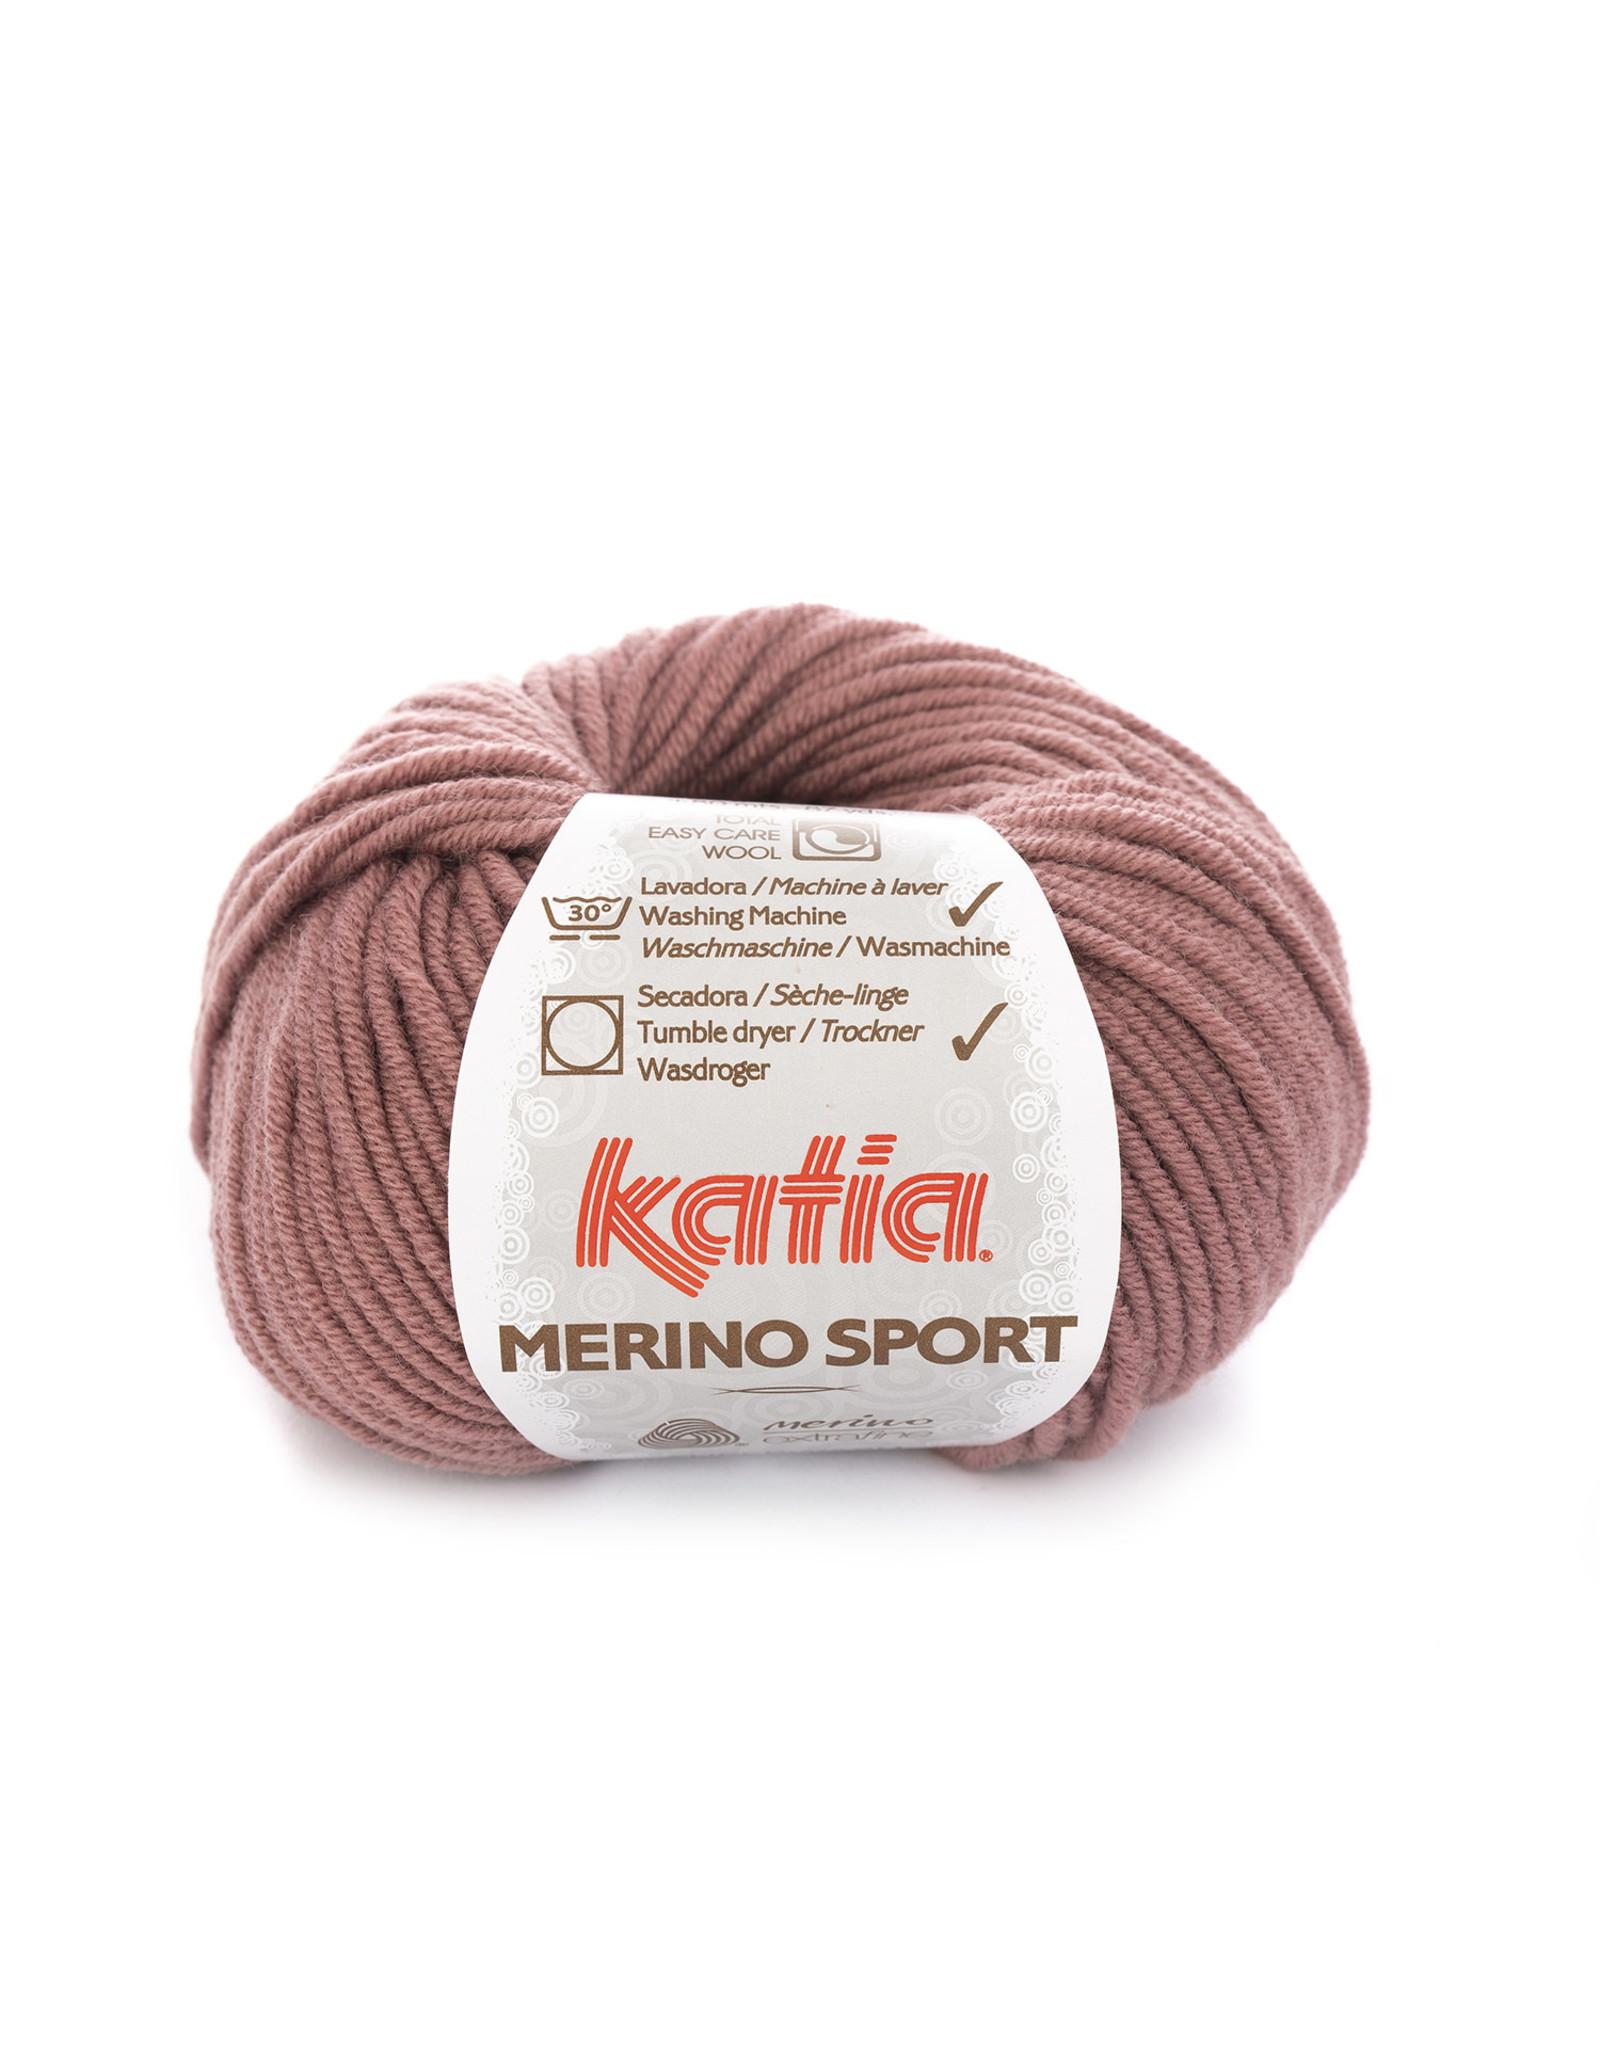 Katia Katia - Merino Sport - 55 Donker bleekrood - bundel 5 x 50 gr.